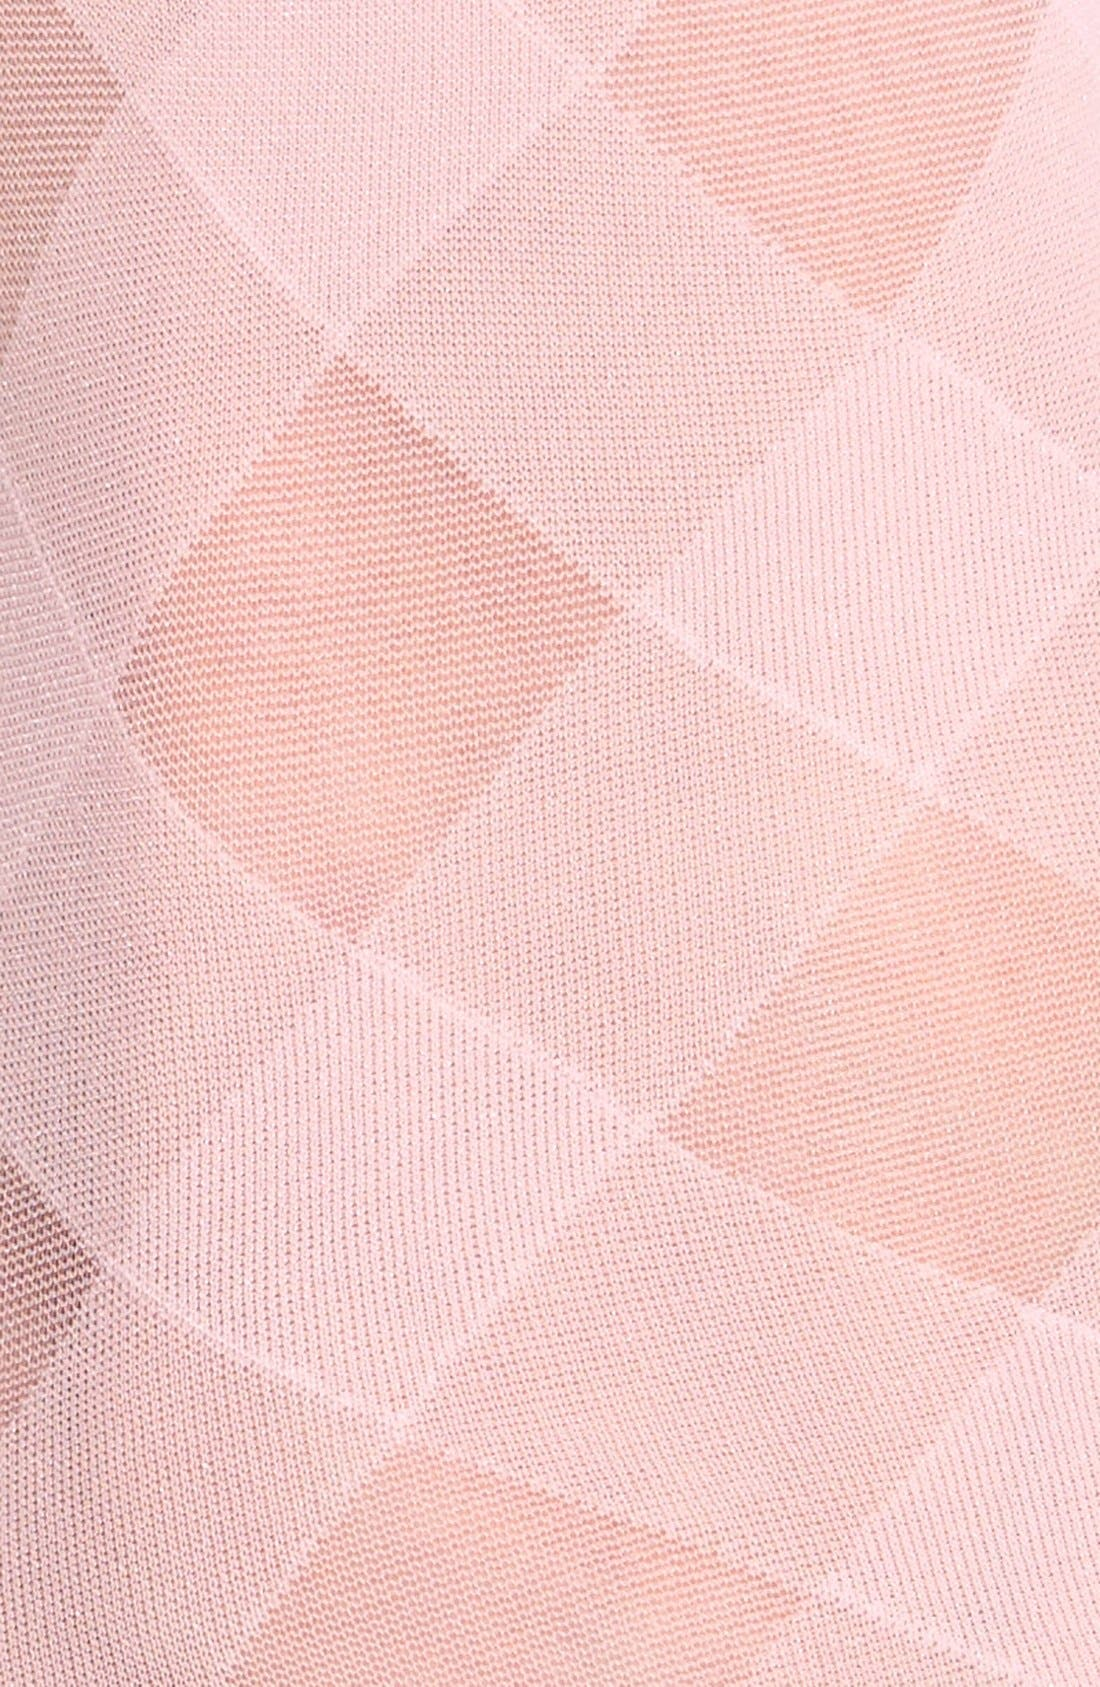 Alternate Image 2  - Hue 'Diagonal Ribbon' Sheer Ankle Socks